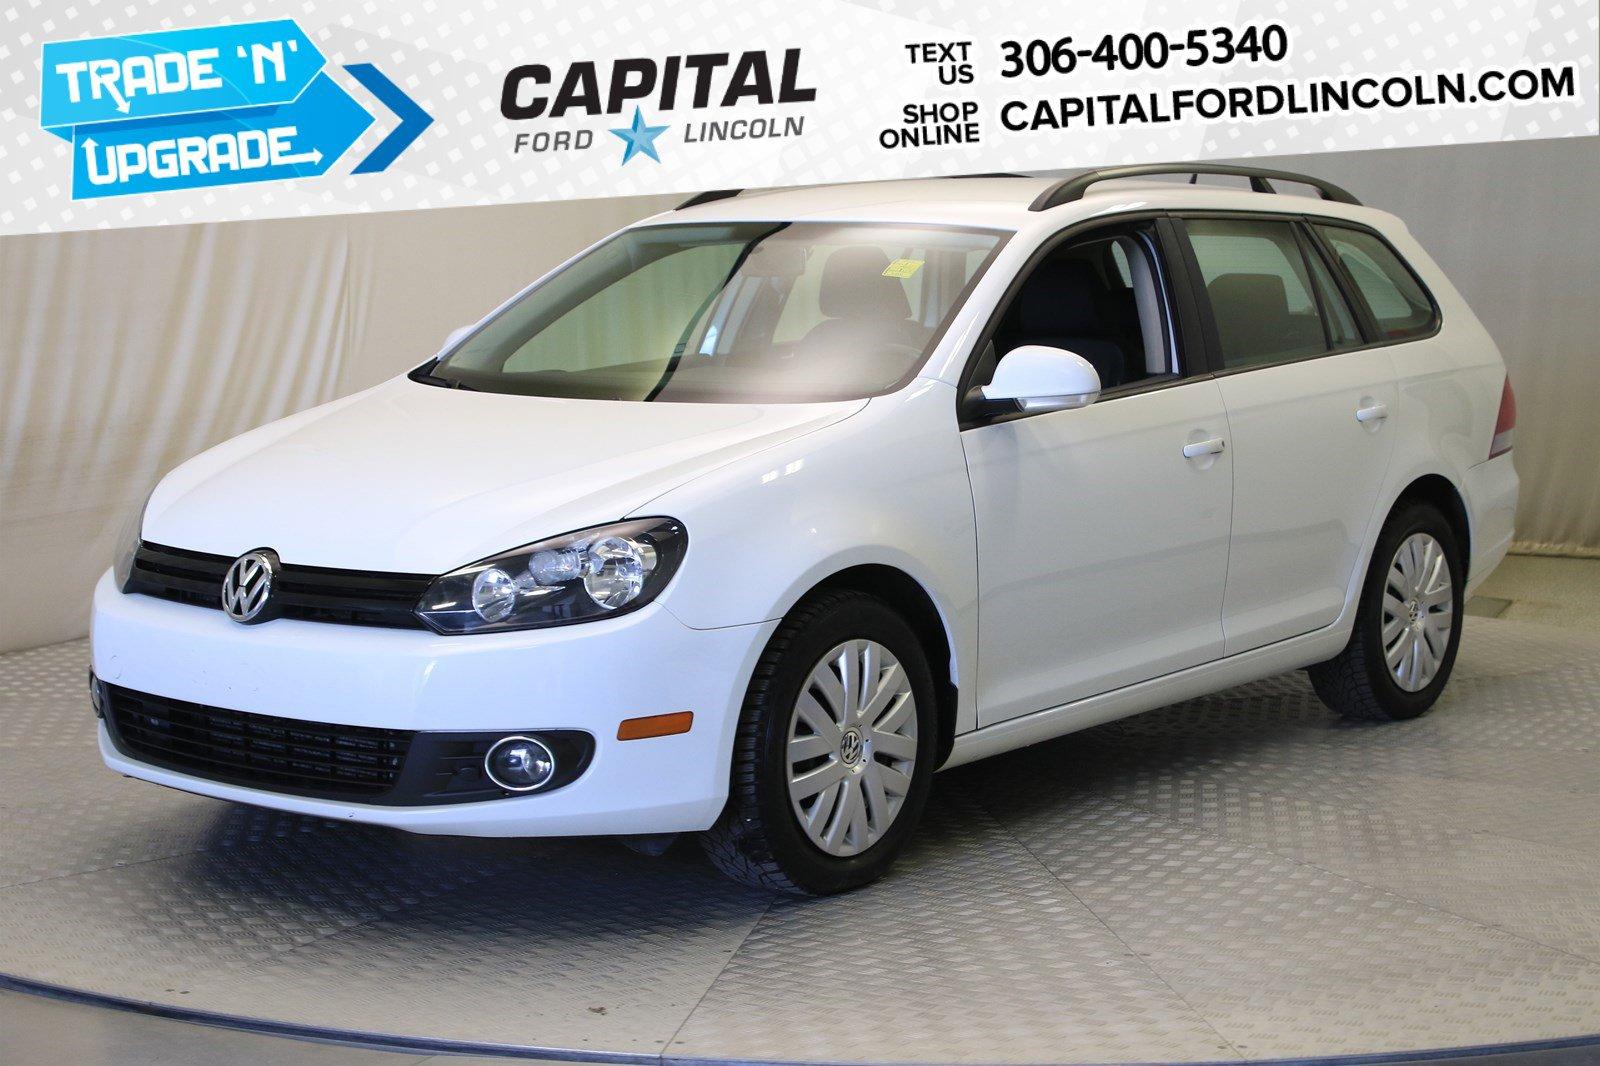 Pre-Owned 2014 Volkswagen Golf Wagon Trendline | Diesel